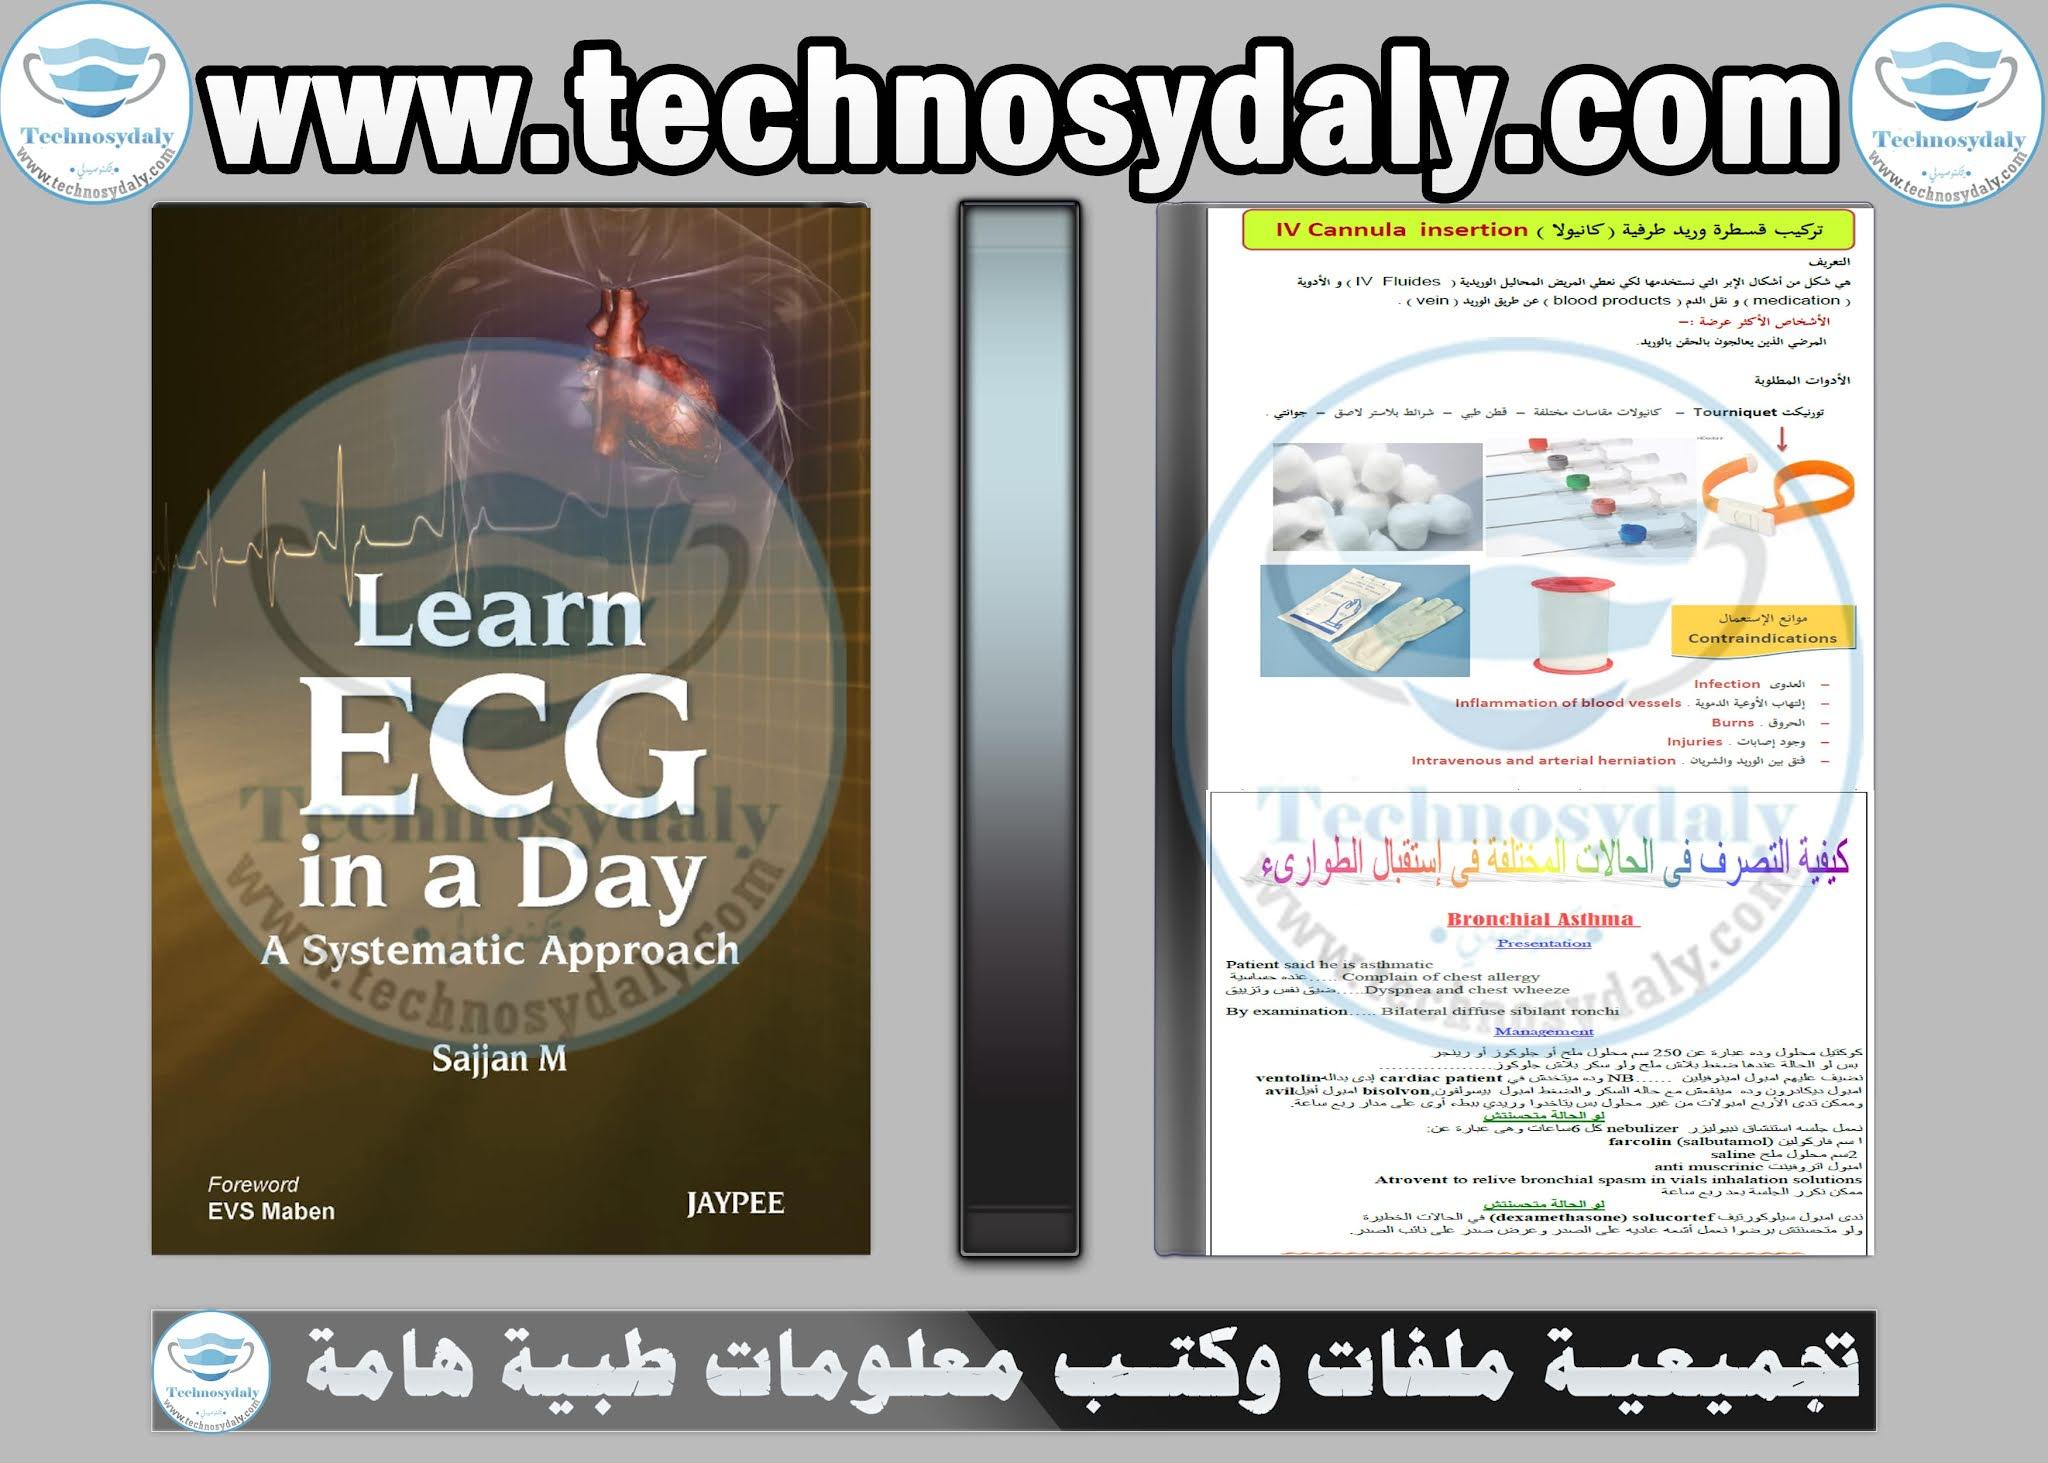 جميعية ملفات وكتب معلومات طبية هامة A compilation of files and books of important medical information pdf